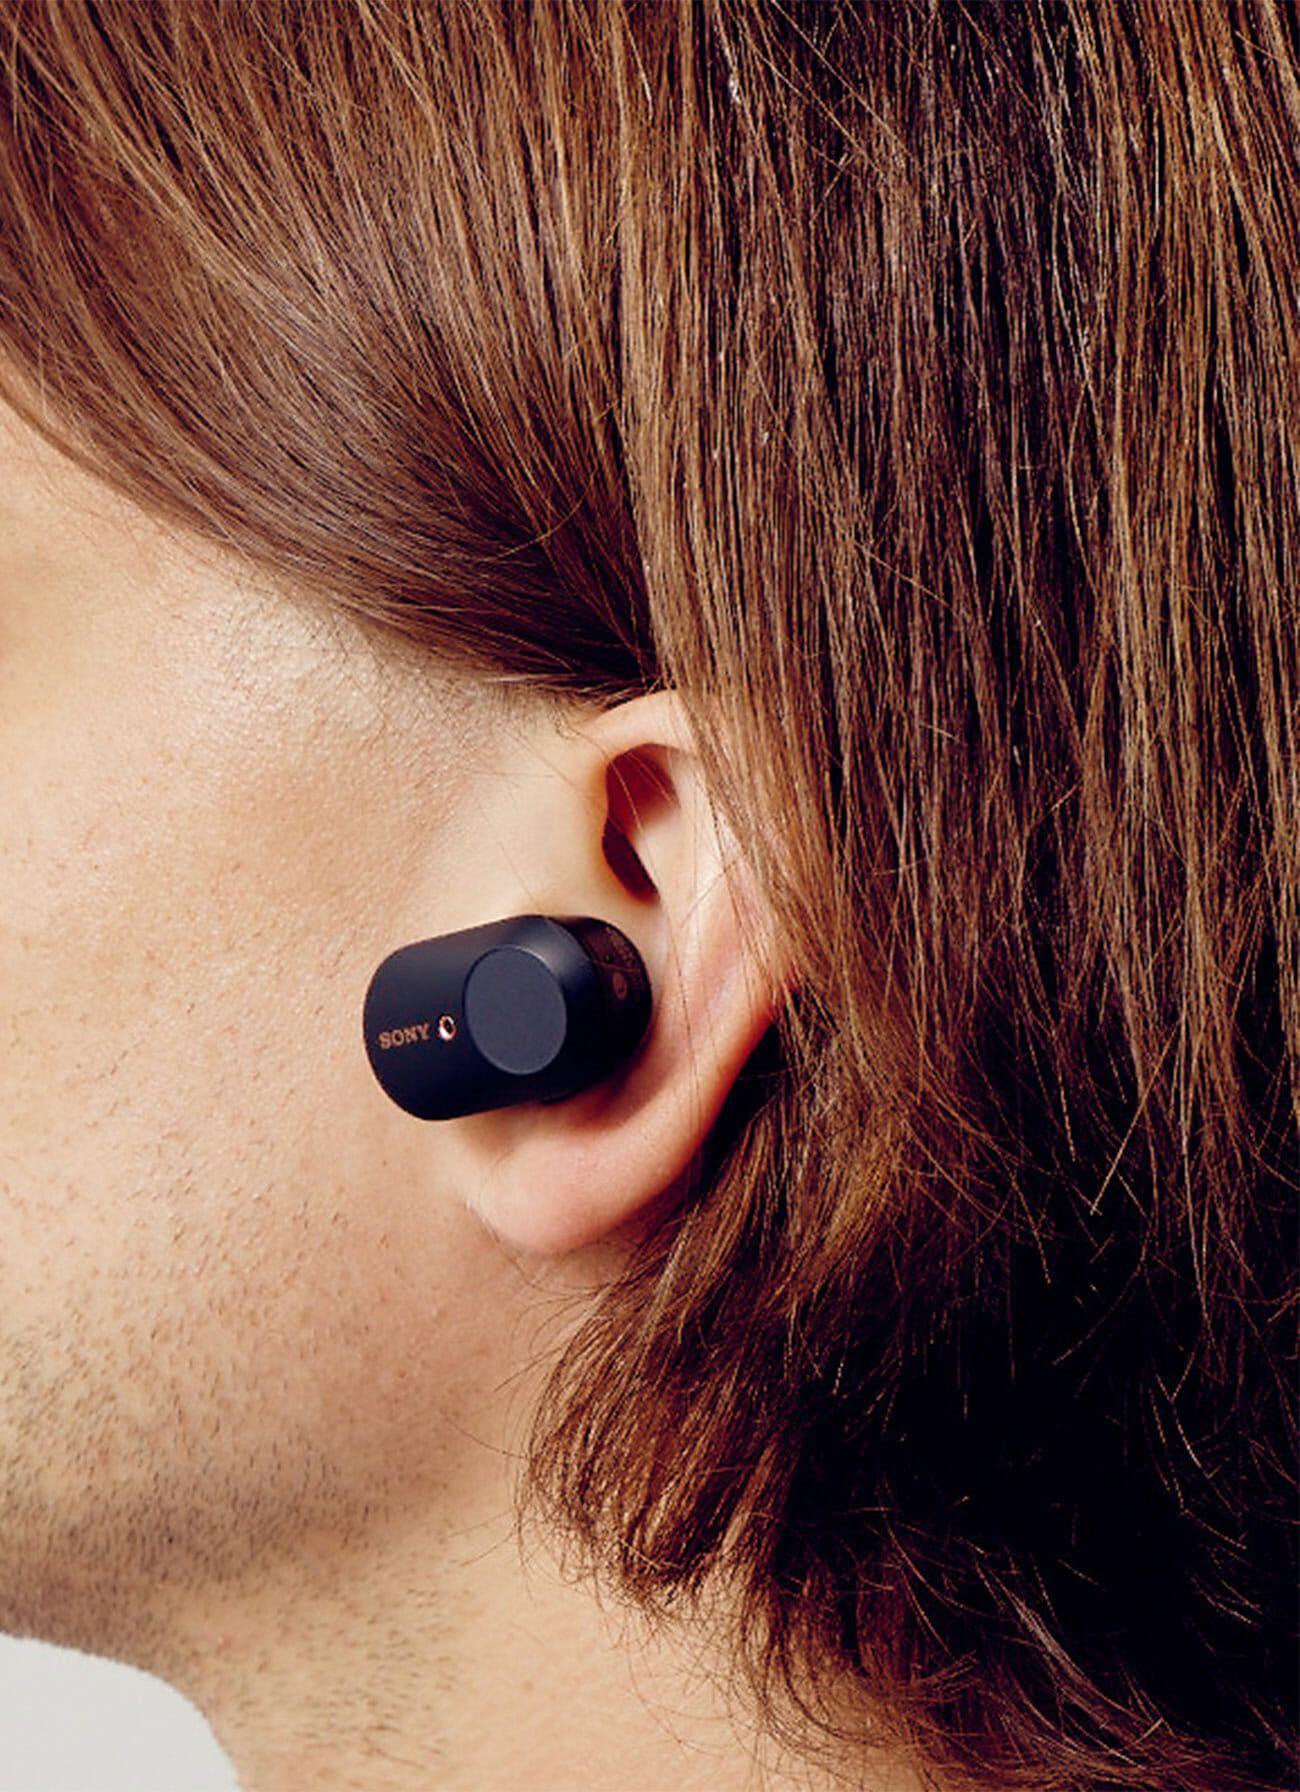 Sony WF-1000XM3: The Best Noise-Canceling Wireless Earbuds of 2019